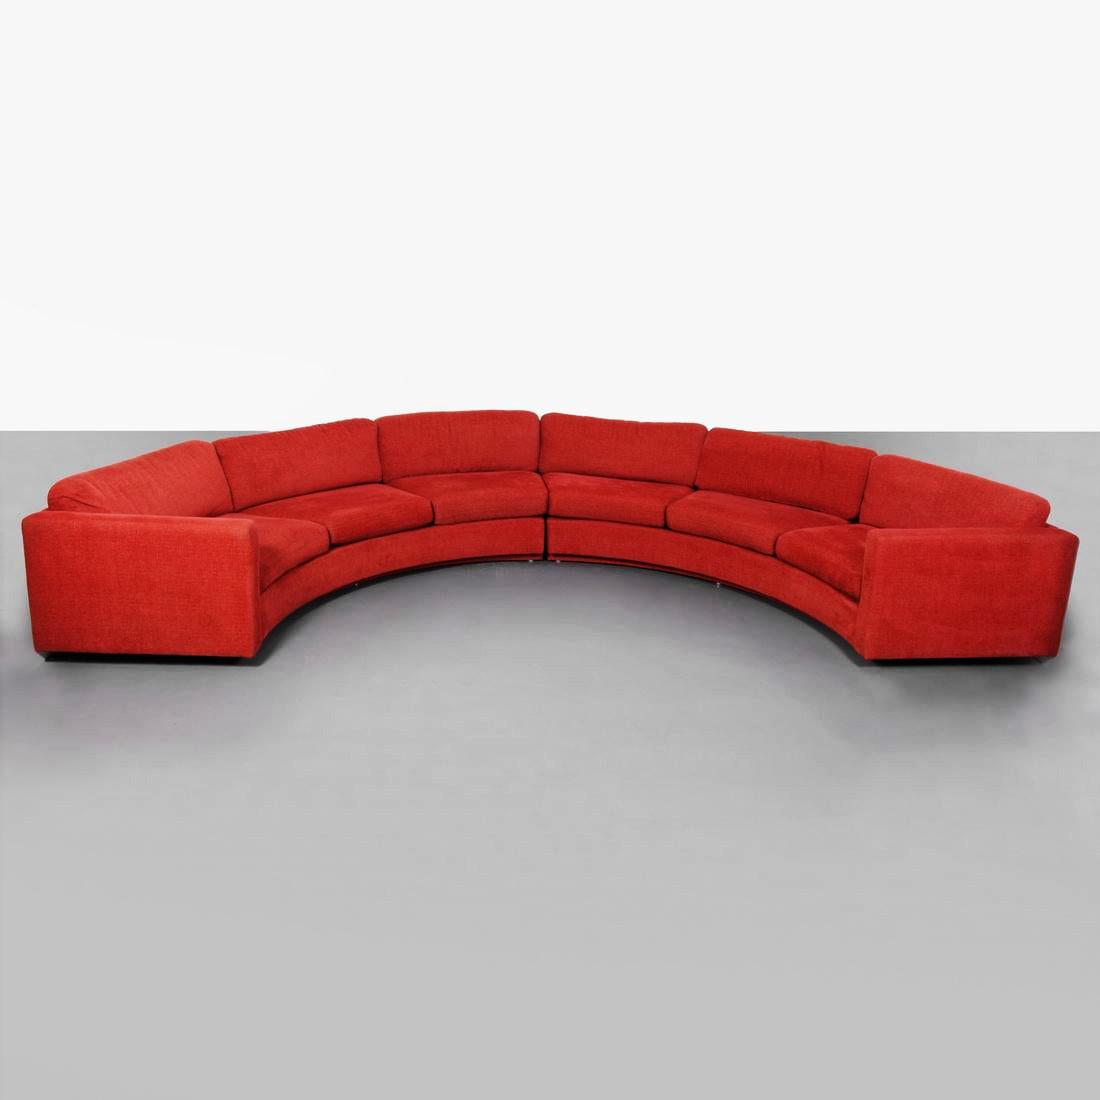 1960 s milo baughman for thayer coggin red half circle sectional sofa